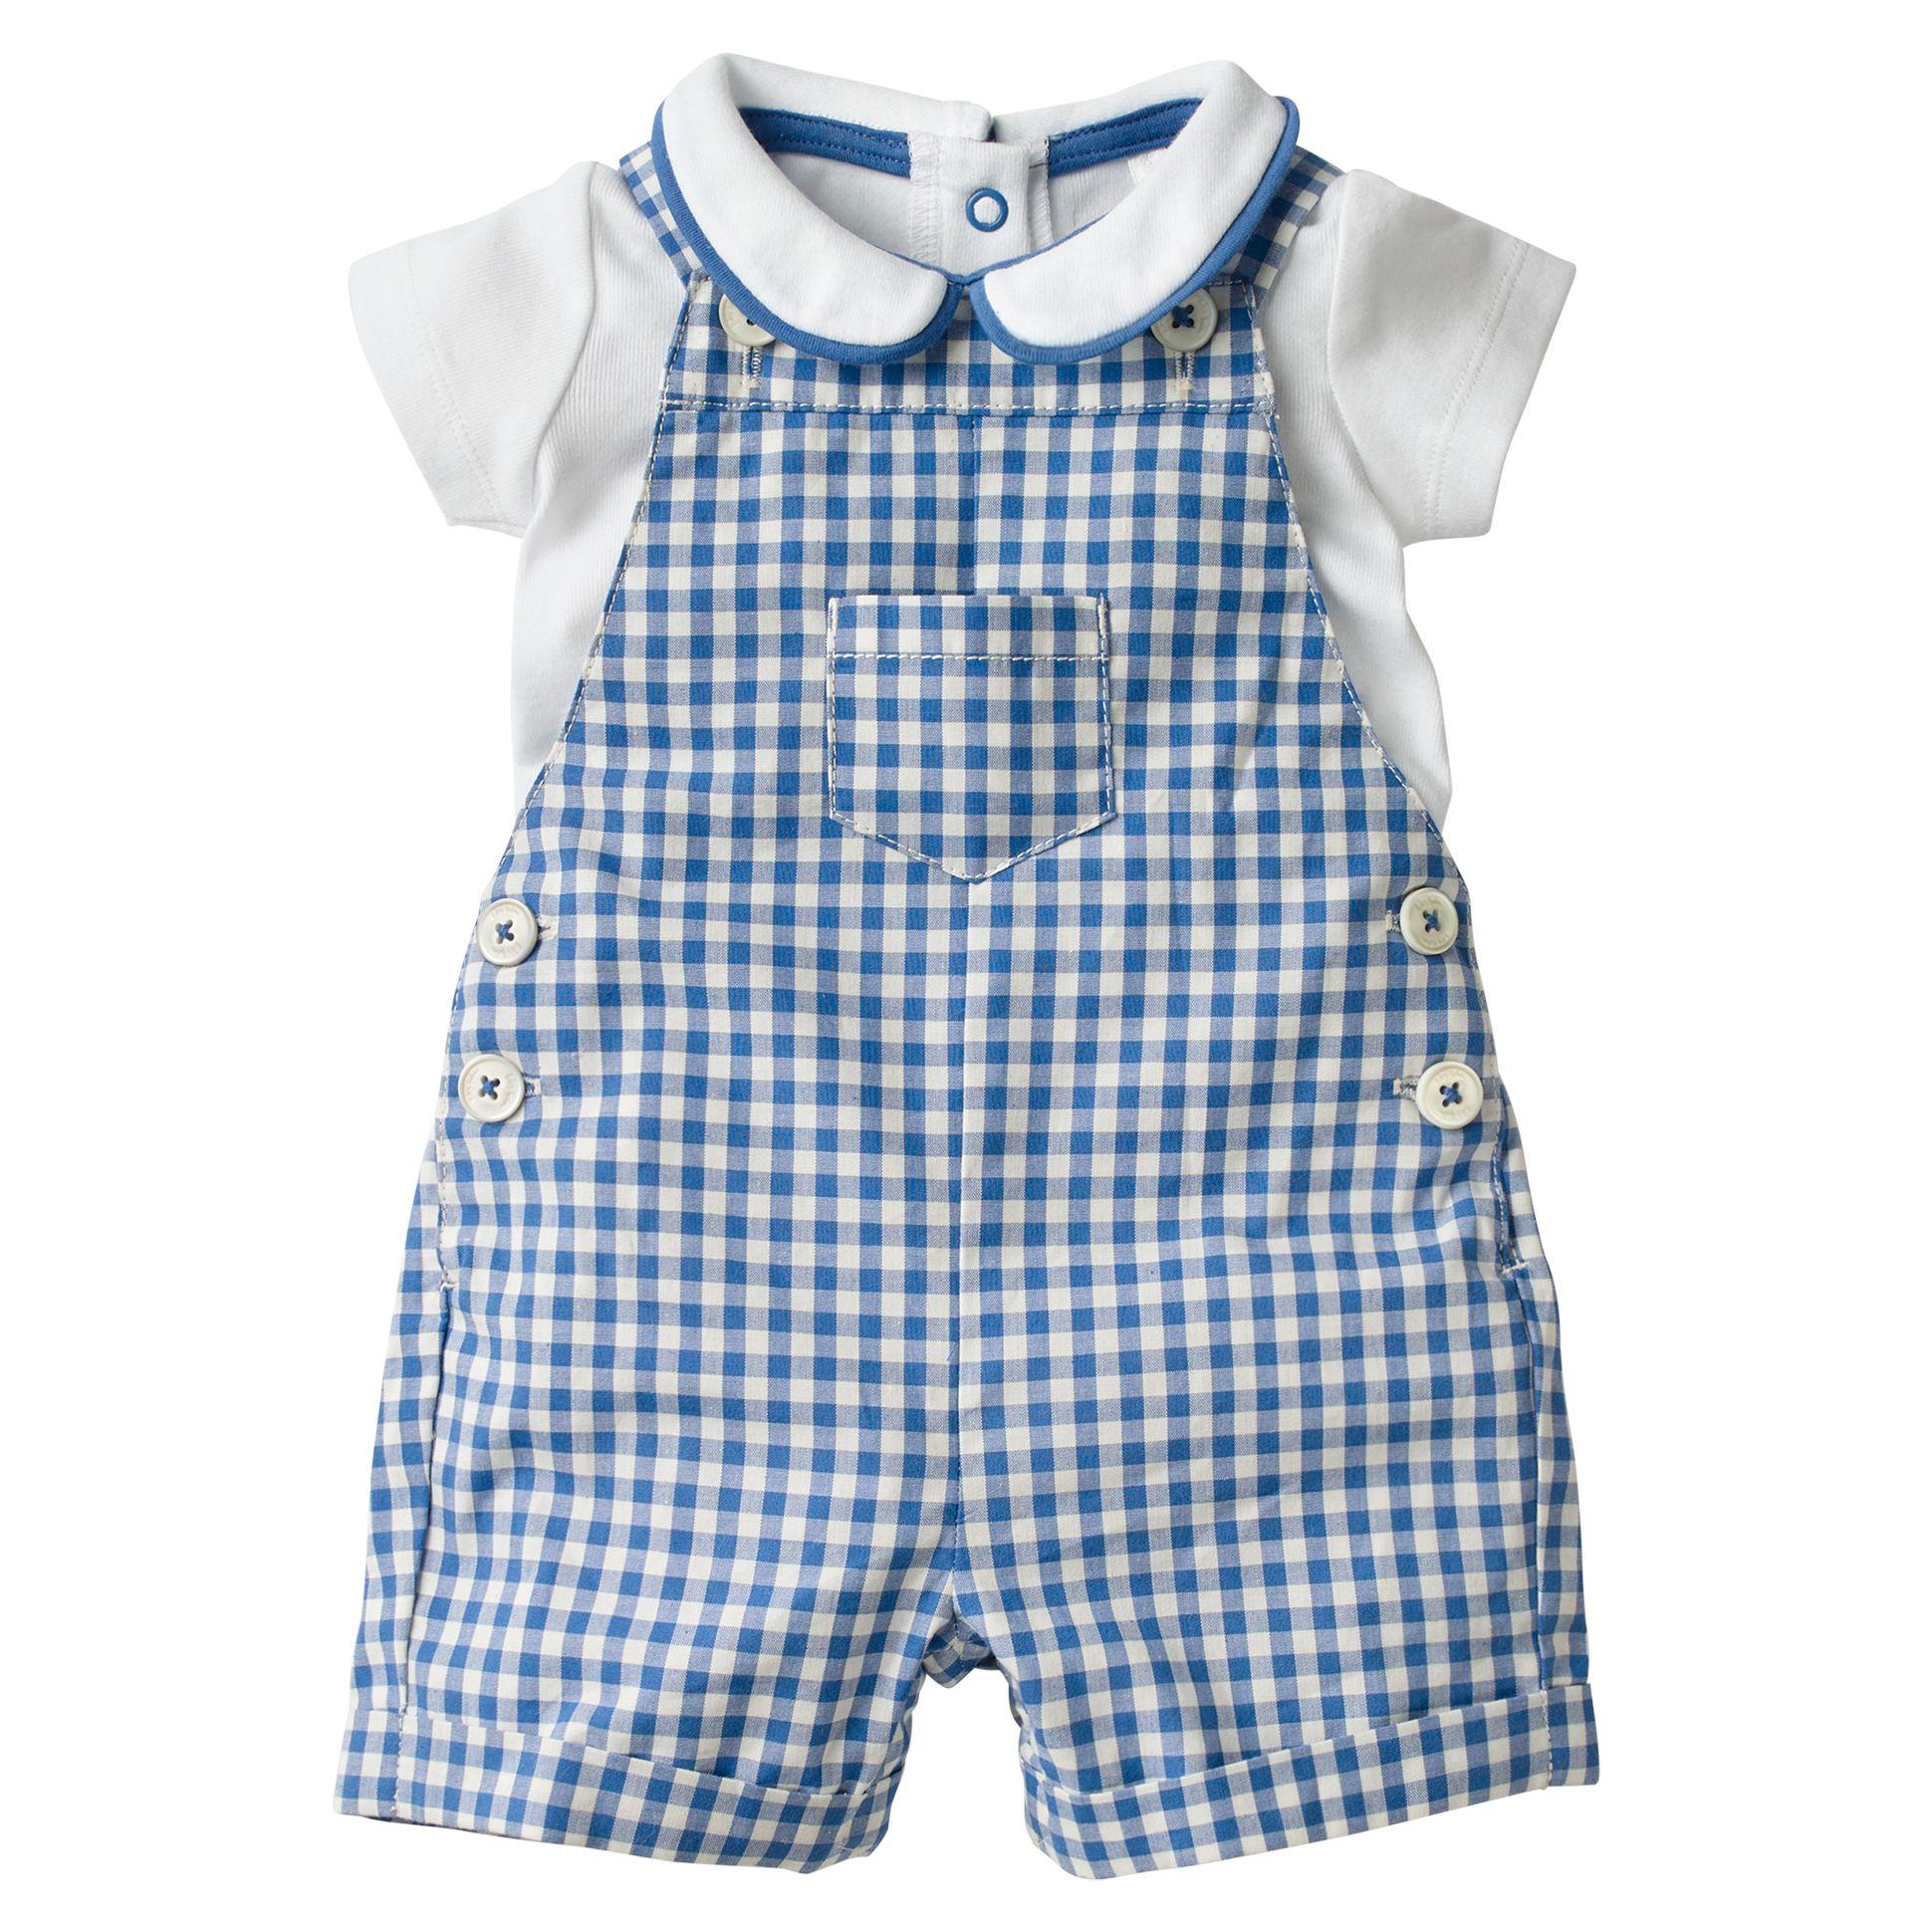 dbb961fe1d08ab Mini Boden Baby Gingham Dungaree Set, Blue at John Lewis & Partners